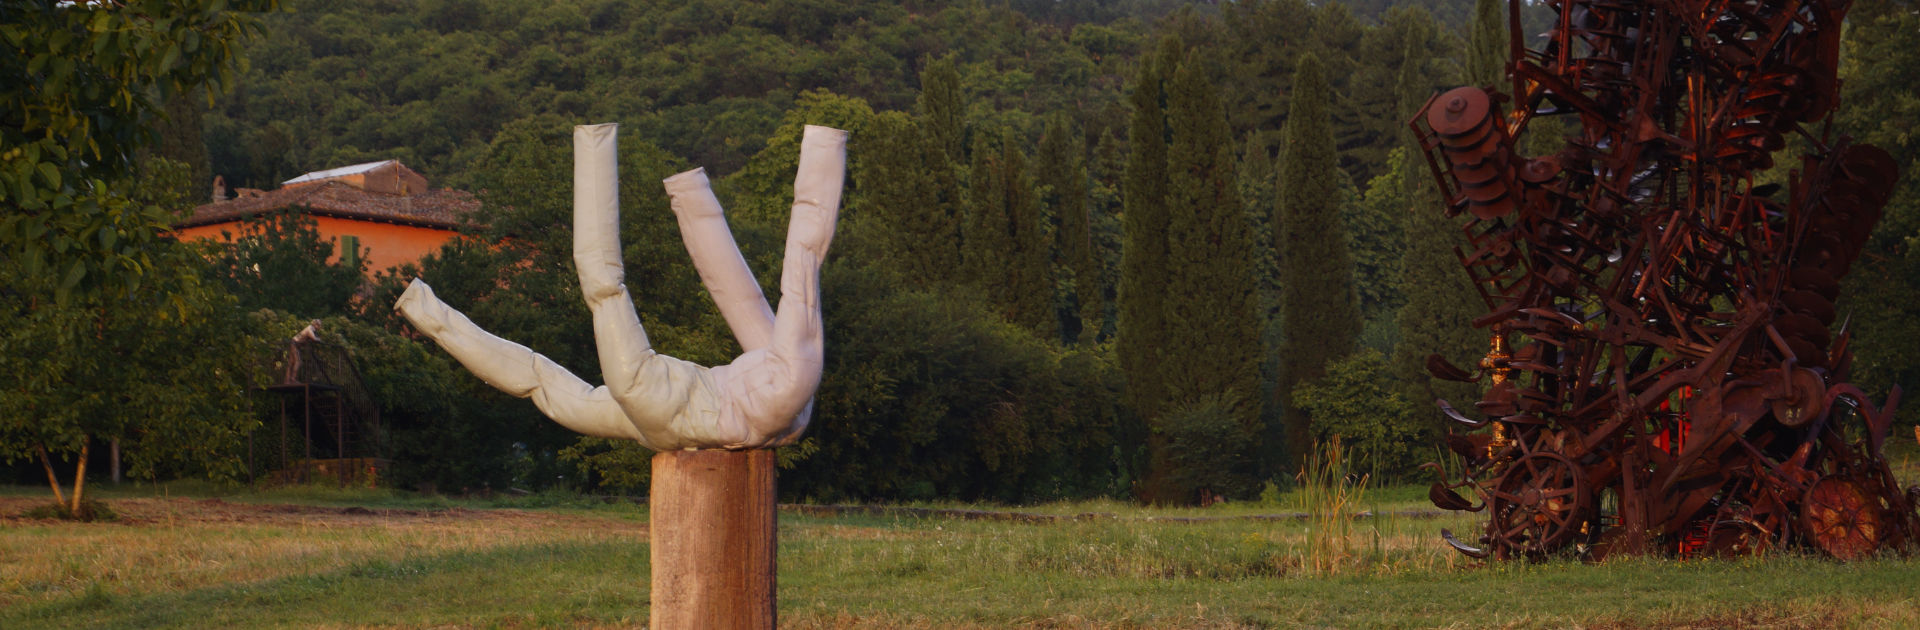 Header Erwin Wurm Giardino di Daniel Spoerri Italiano